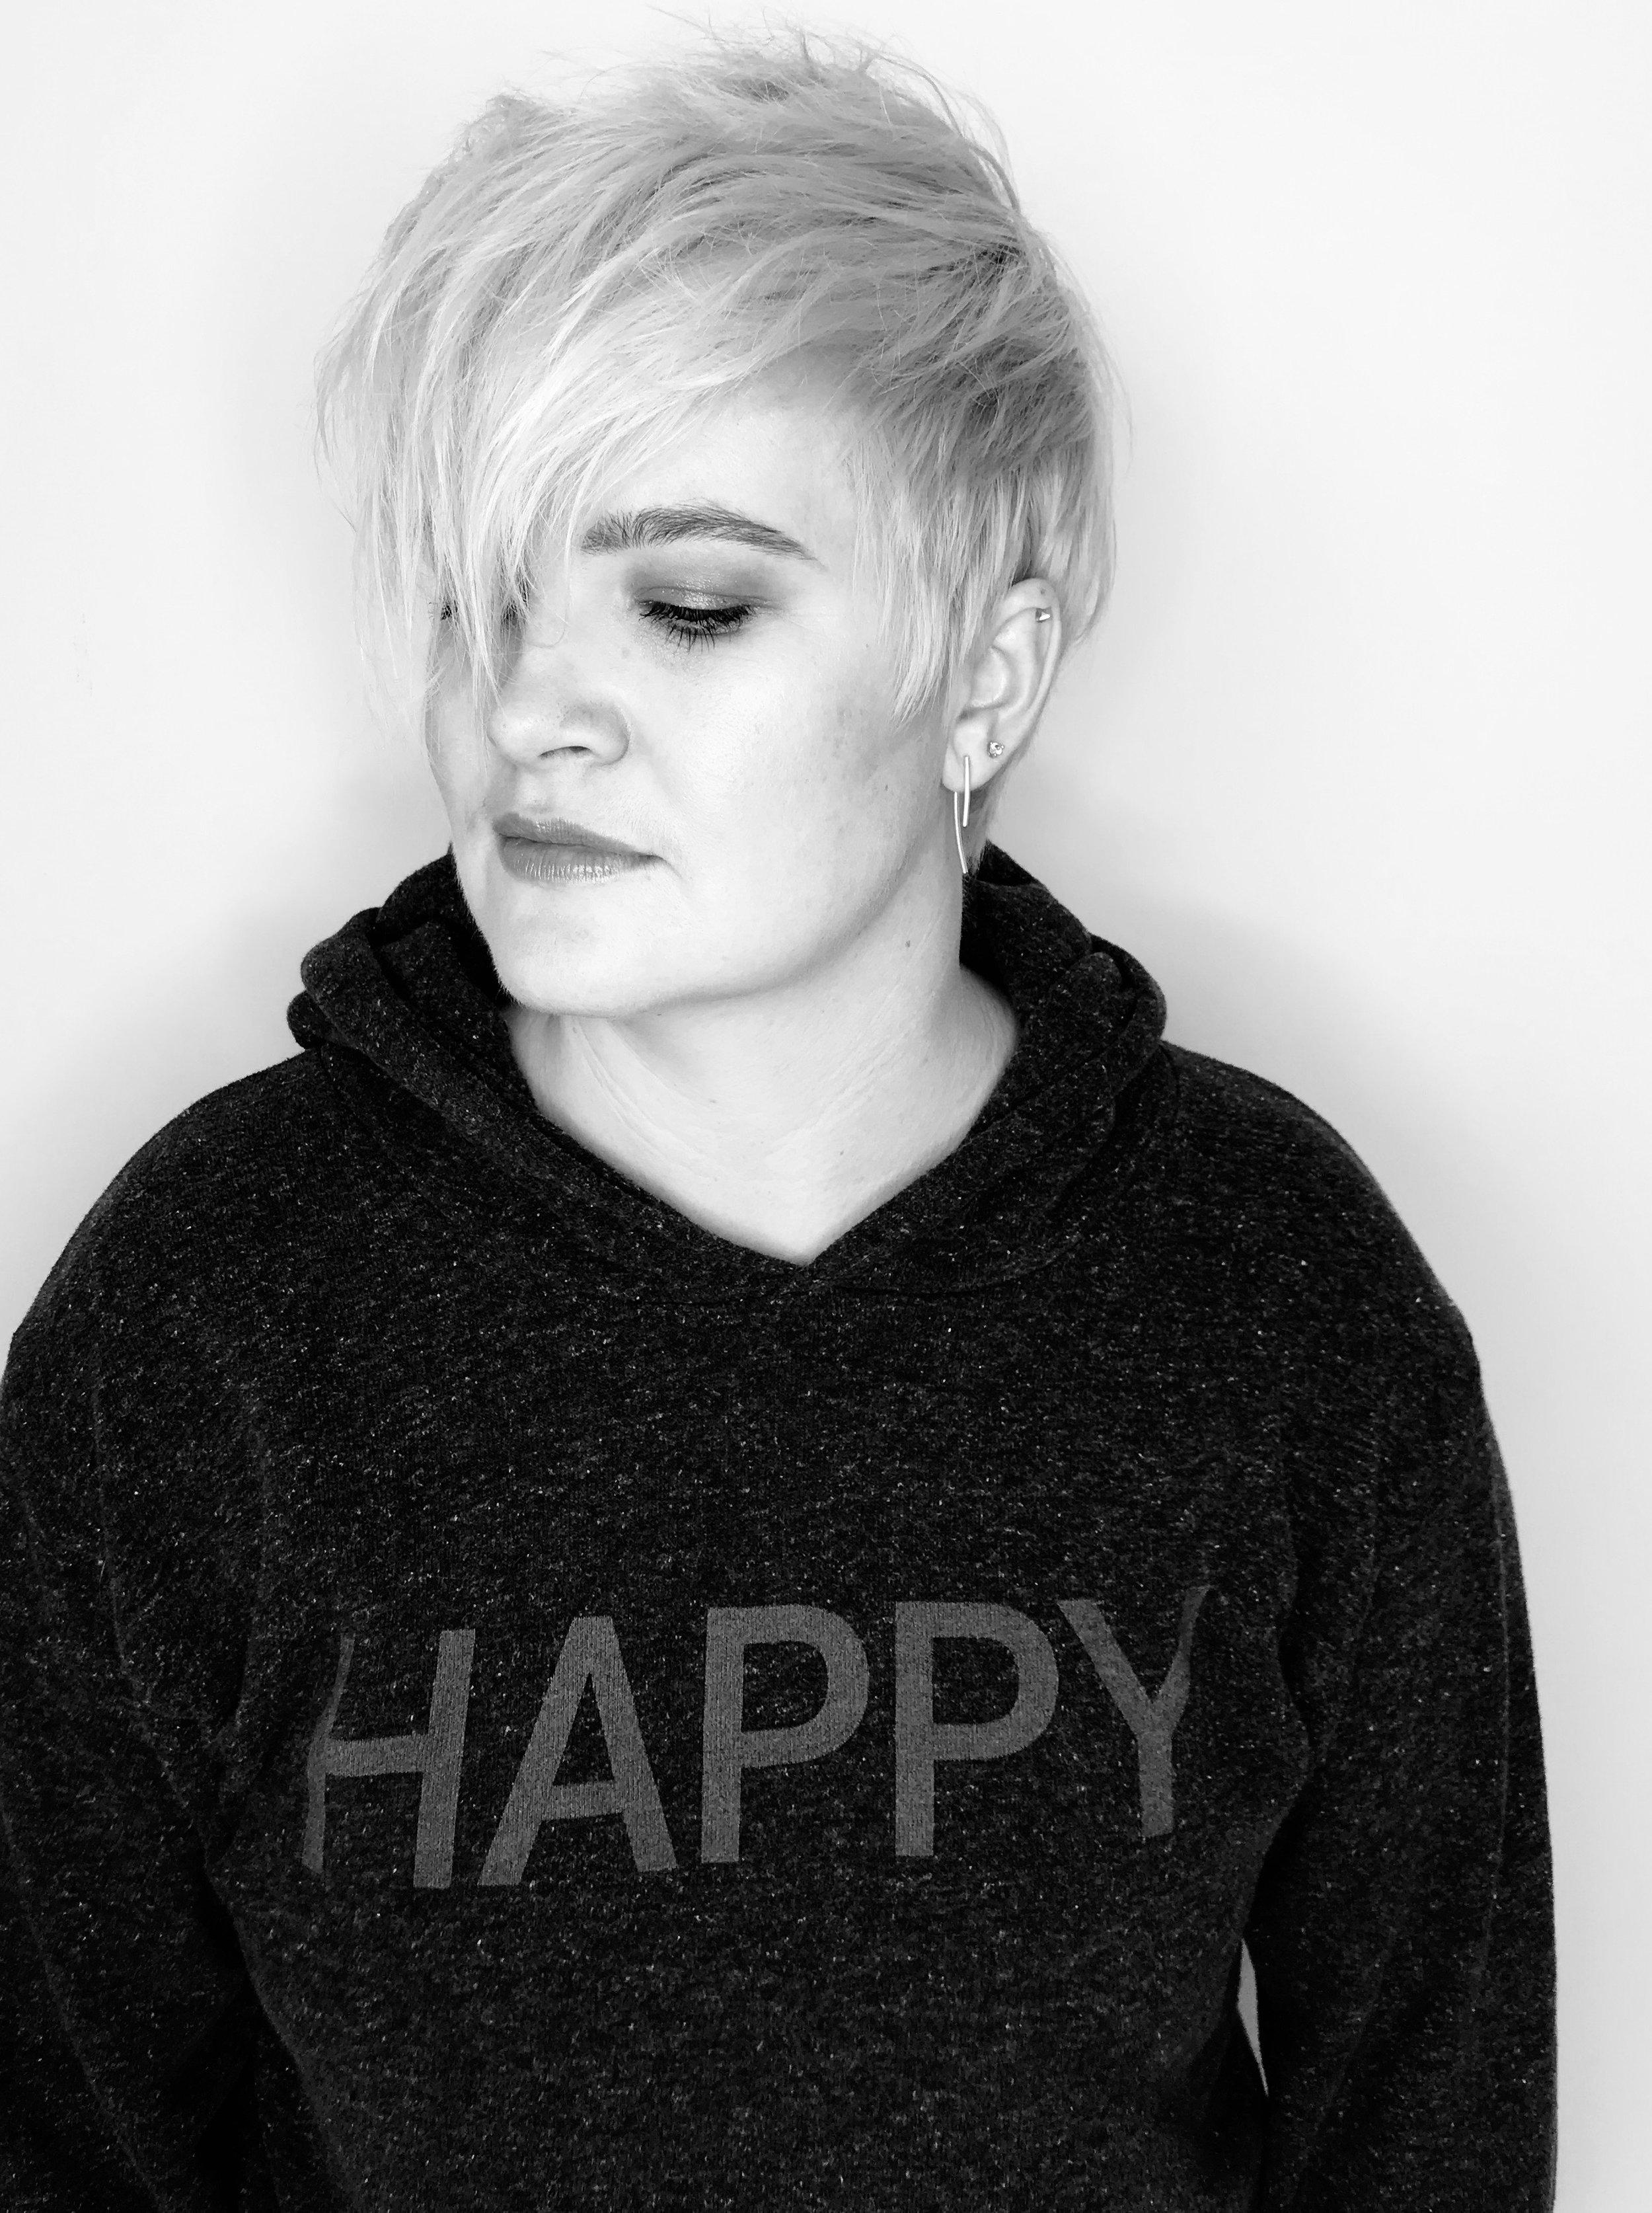 Happy:blackwhite.jpg